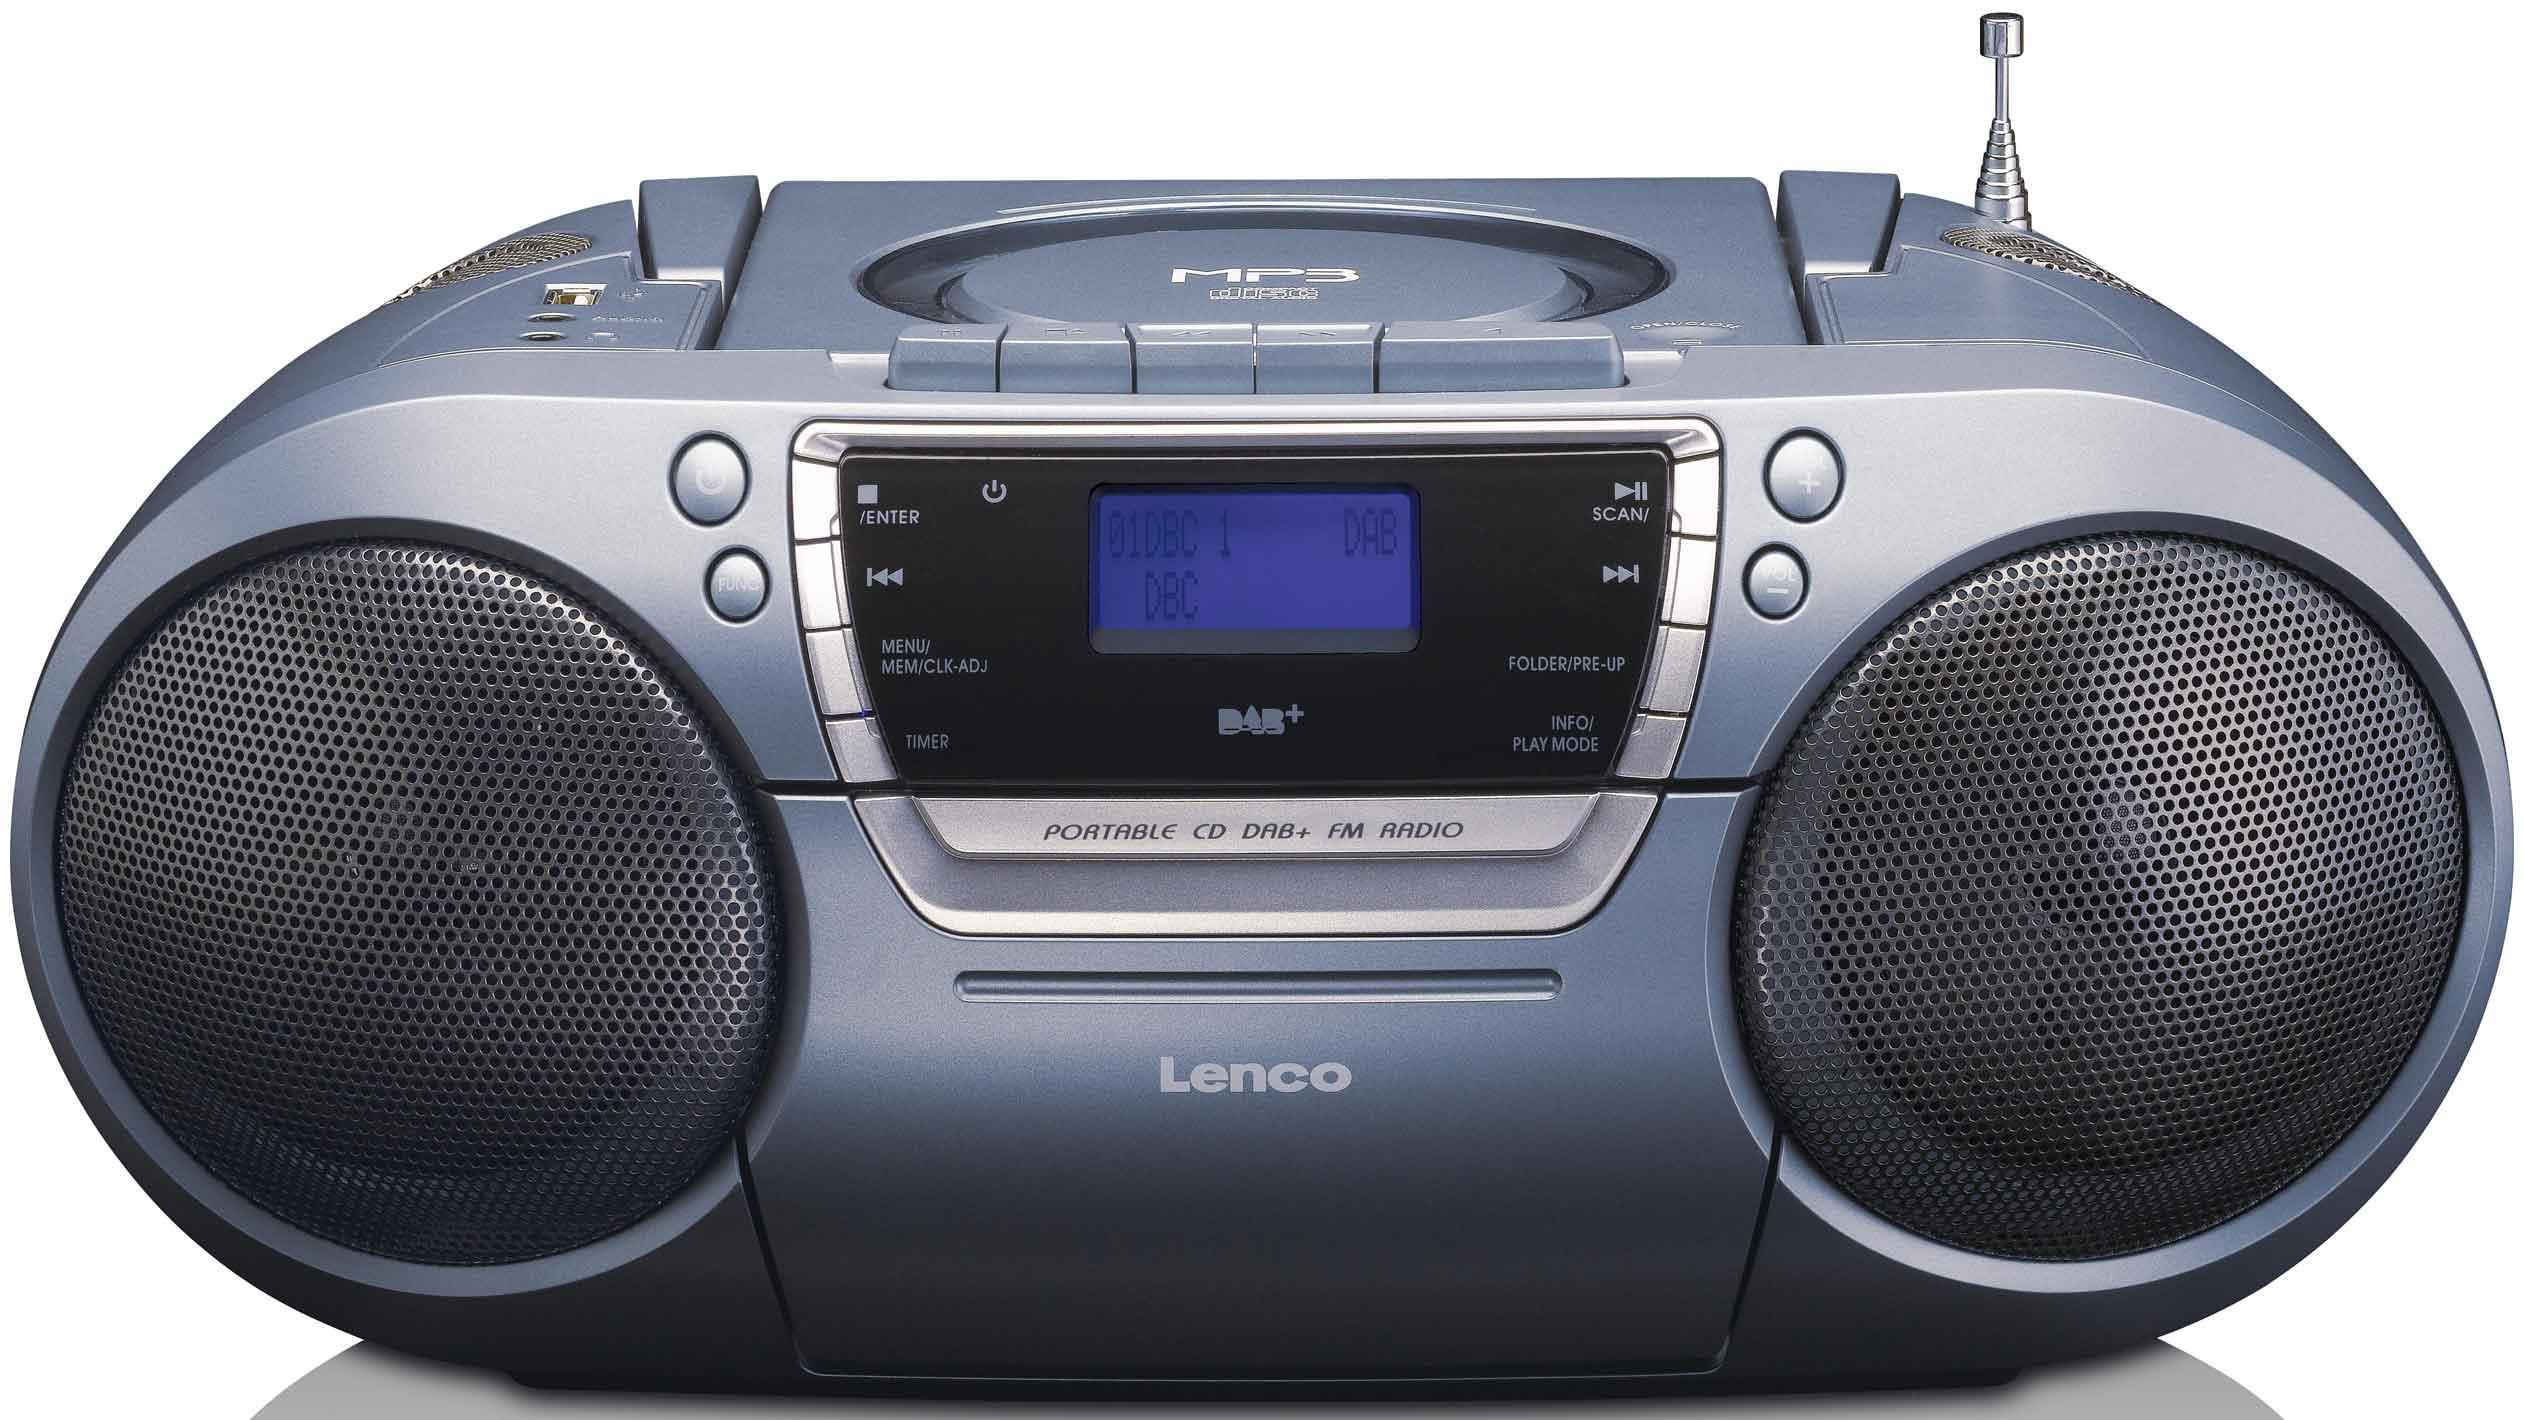 Lenco Boombox 4 högtalare USB